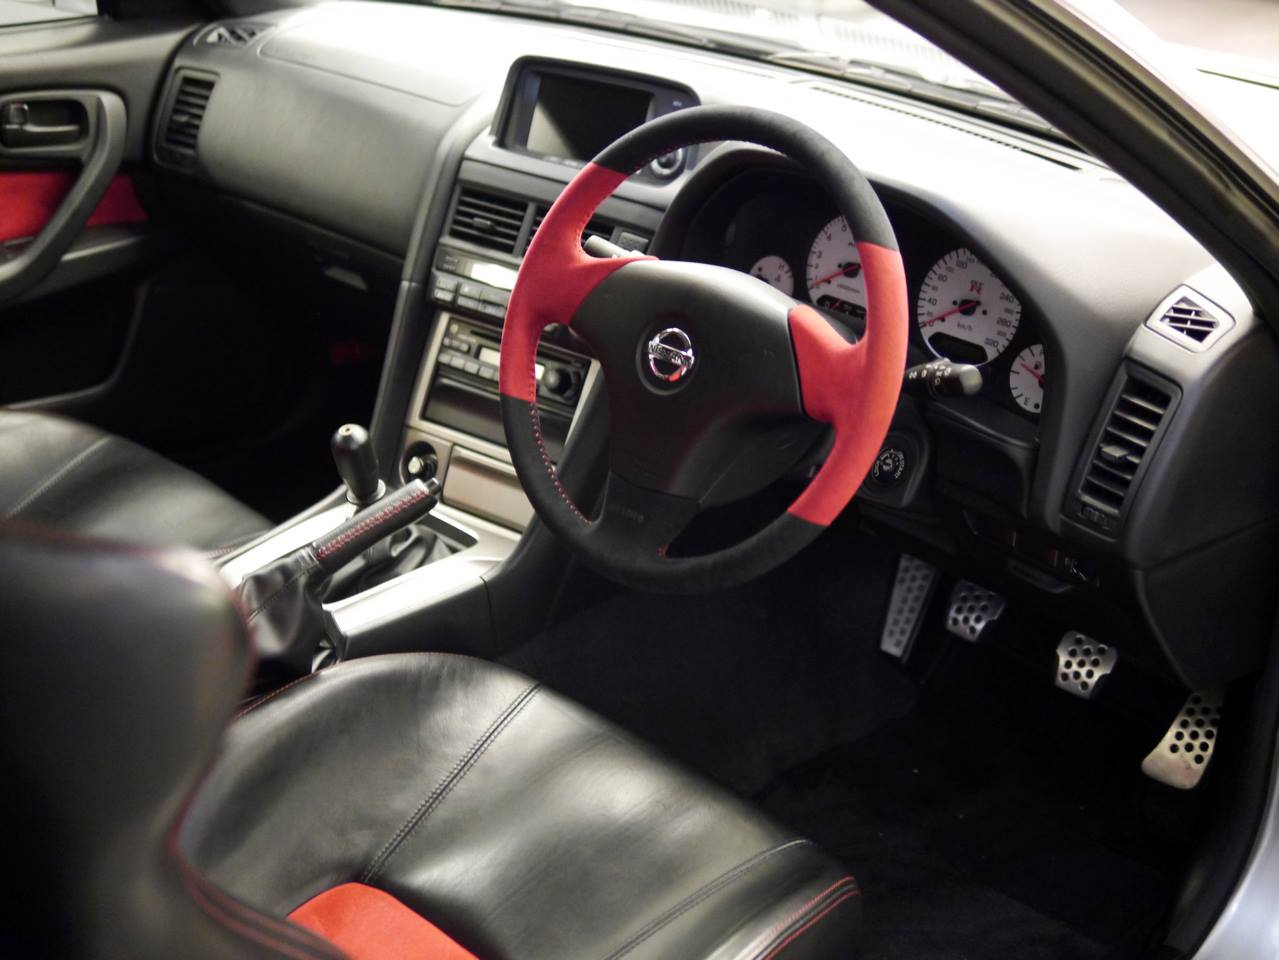 Nismo Nissan GT-R R34 Z -Tune for sale (12)